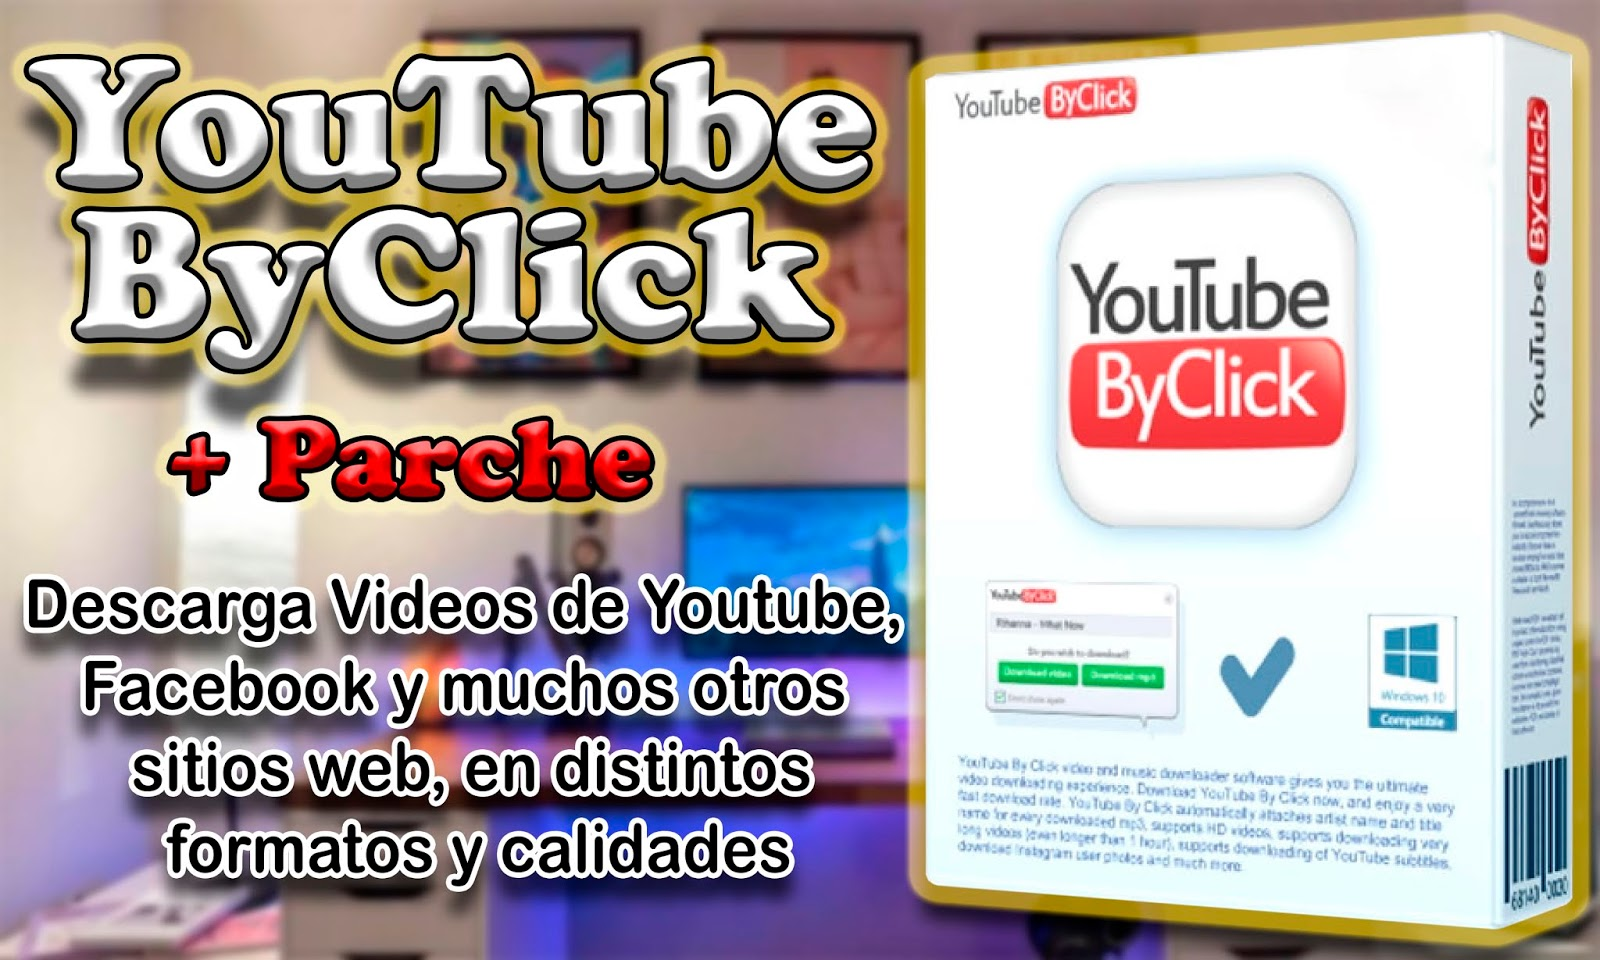 youtubebyclick no virus